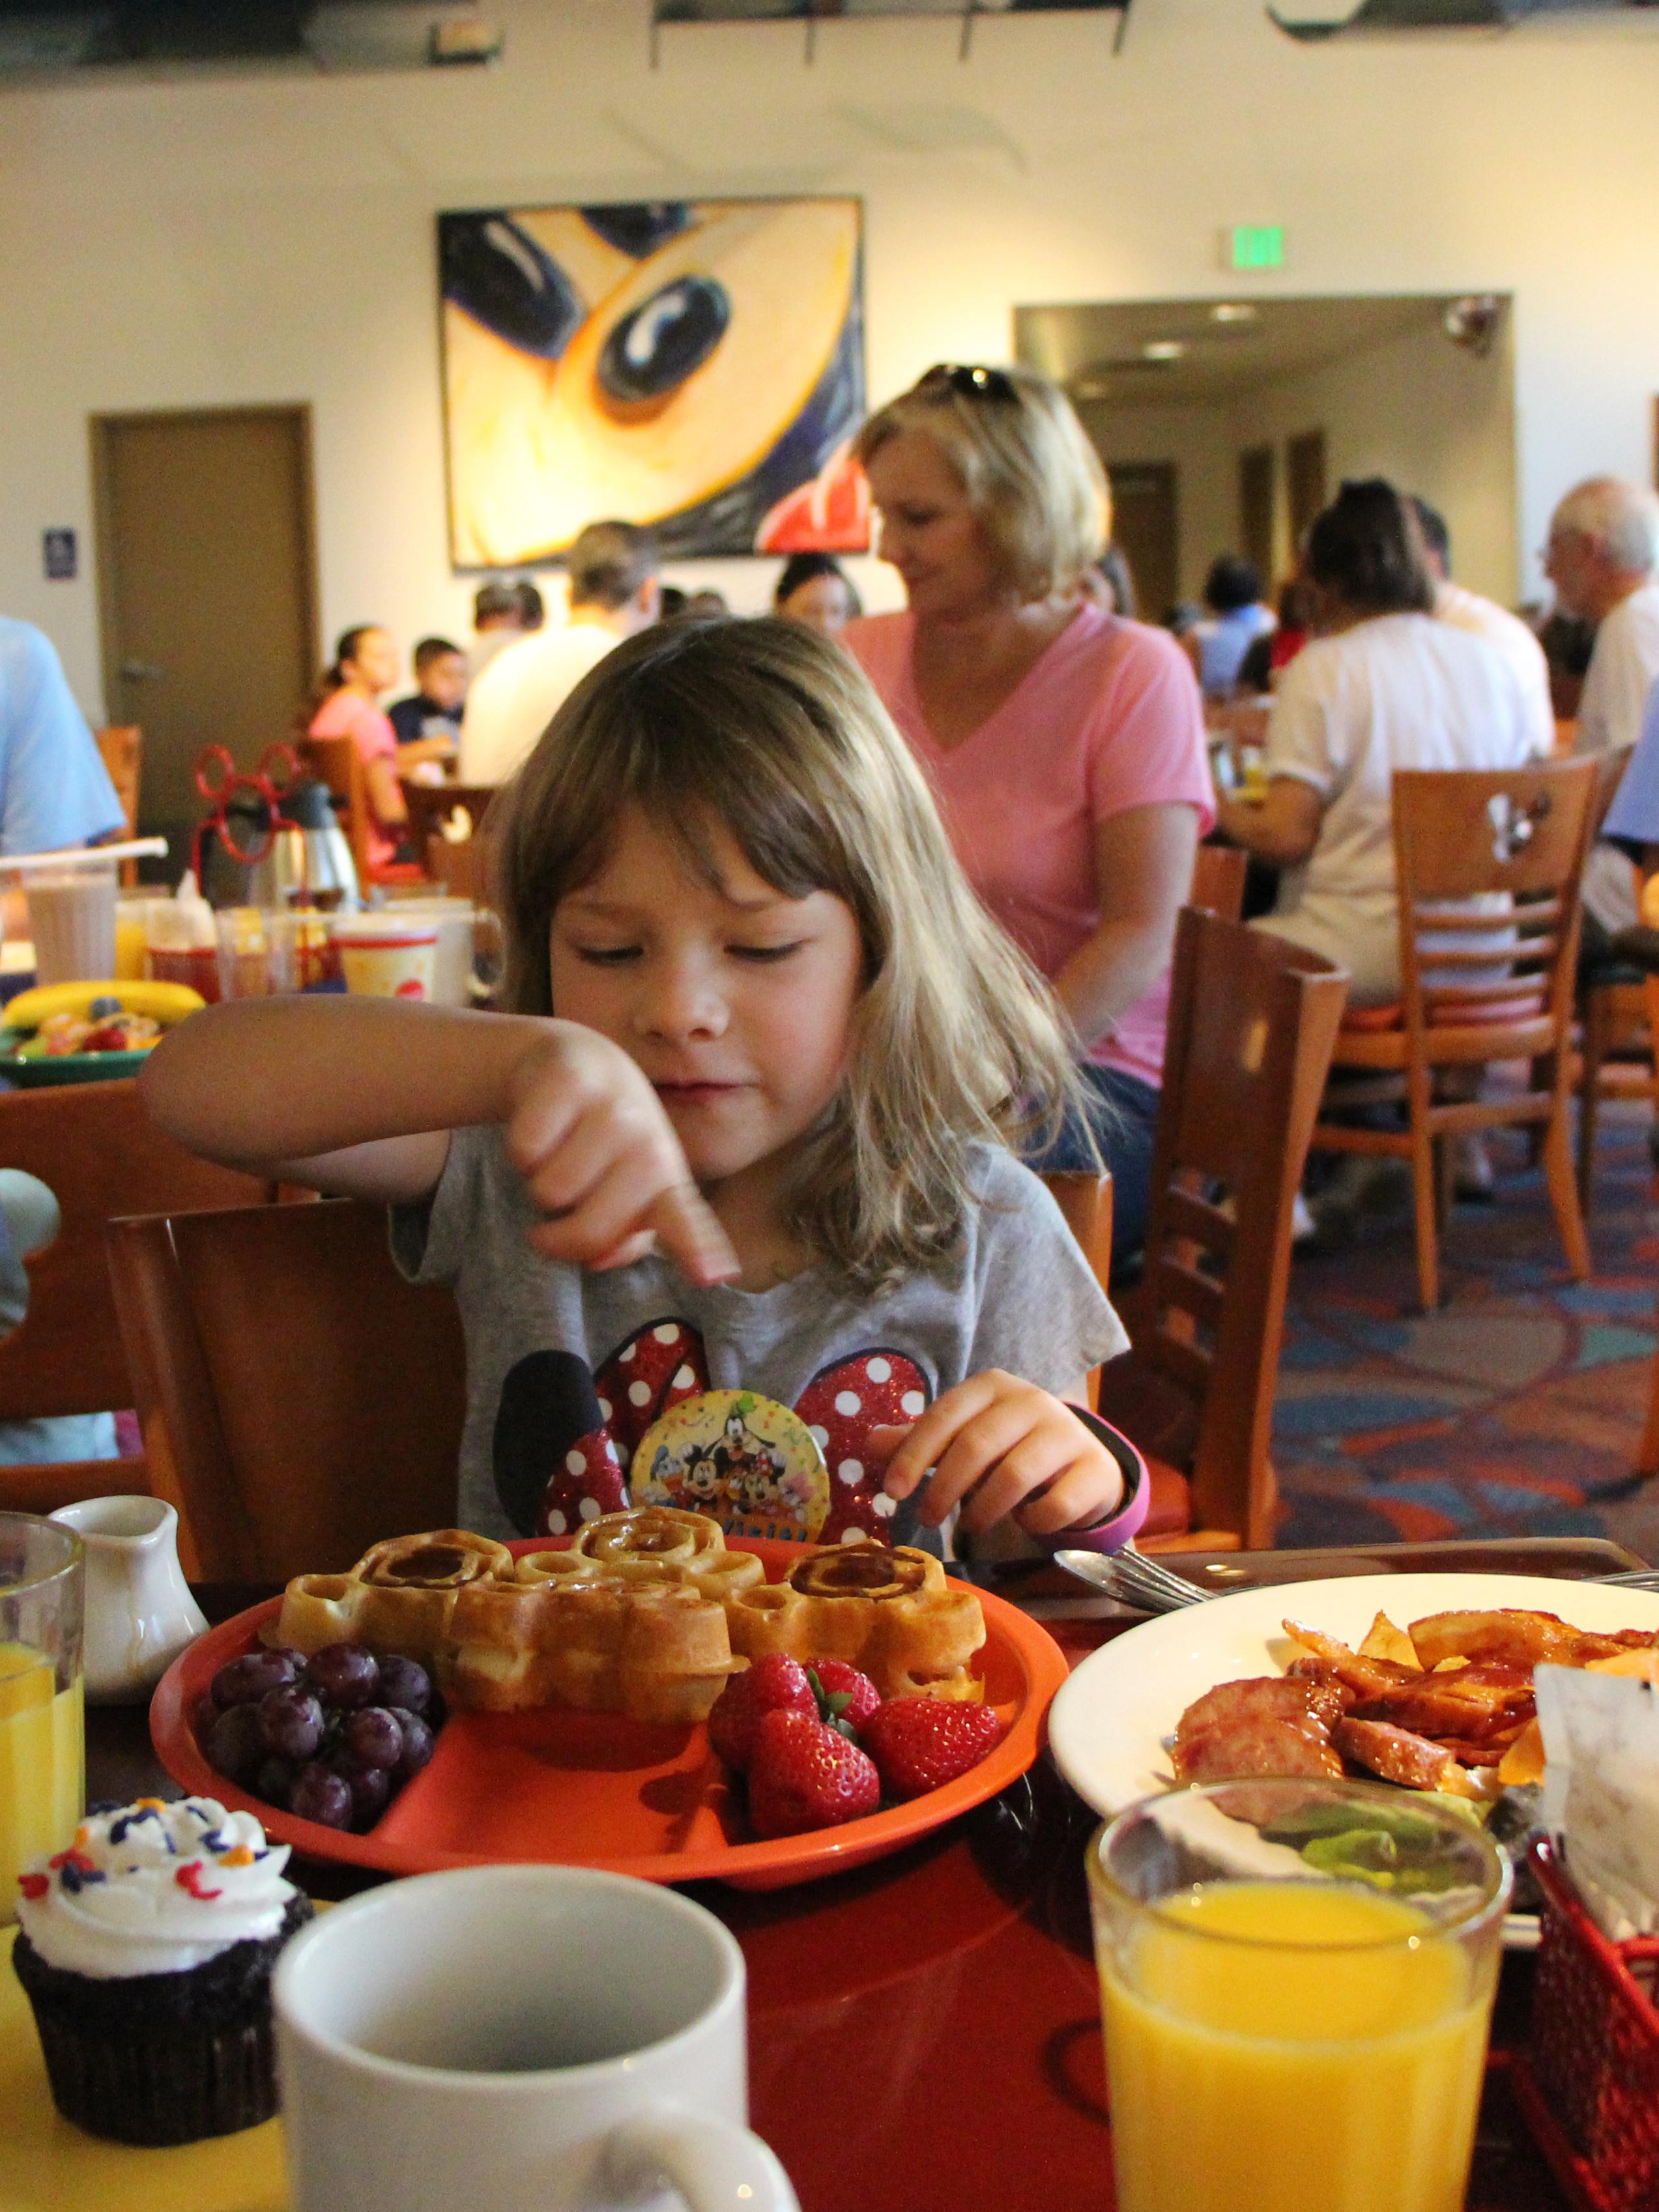 Chef Mickeys dairy-free egg-free breakfast